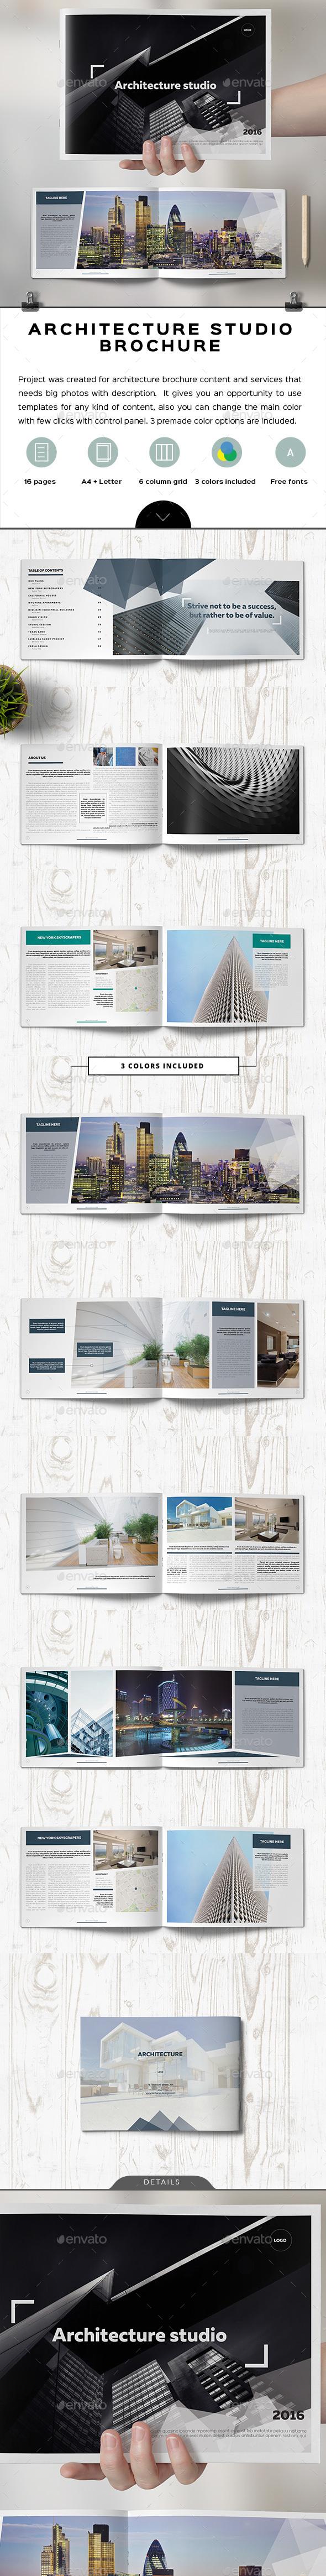 Boso Architecture Landscape Brochure - Catalogs Brochures